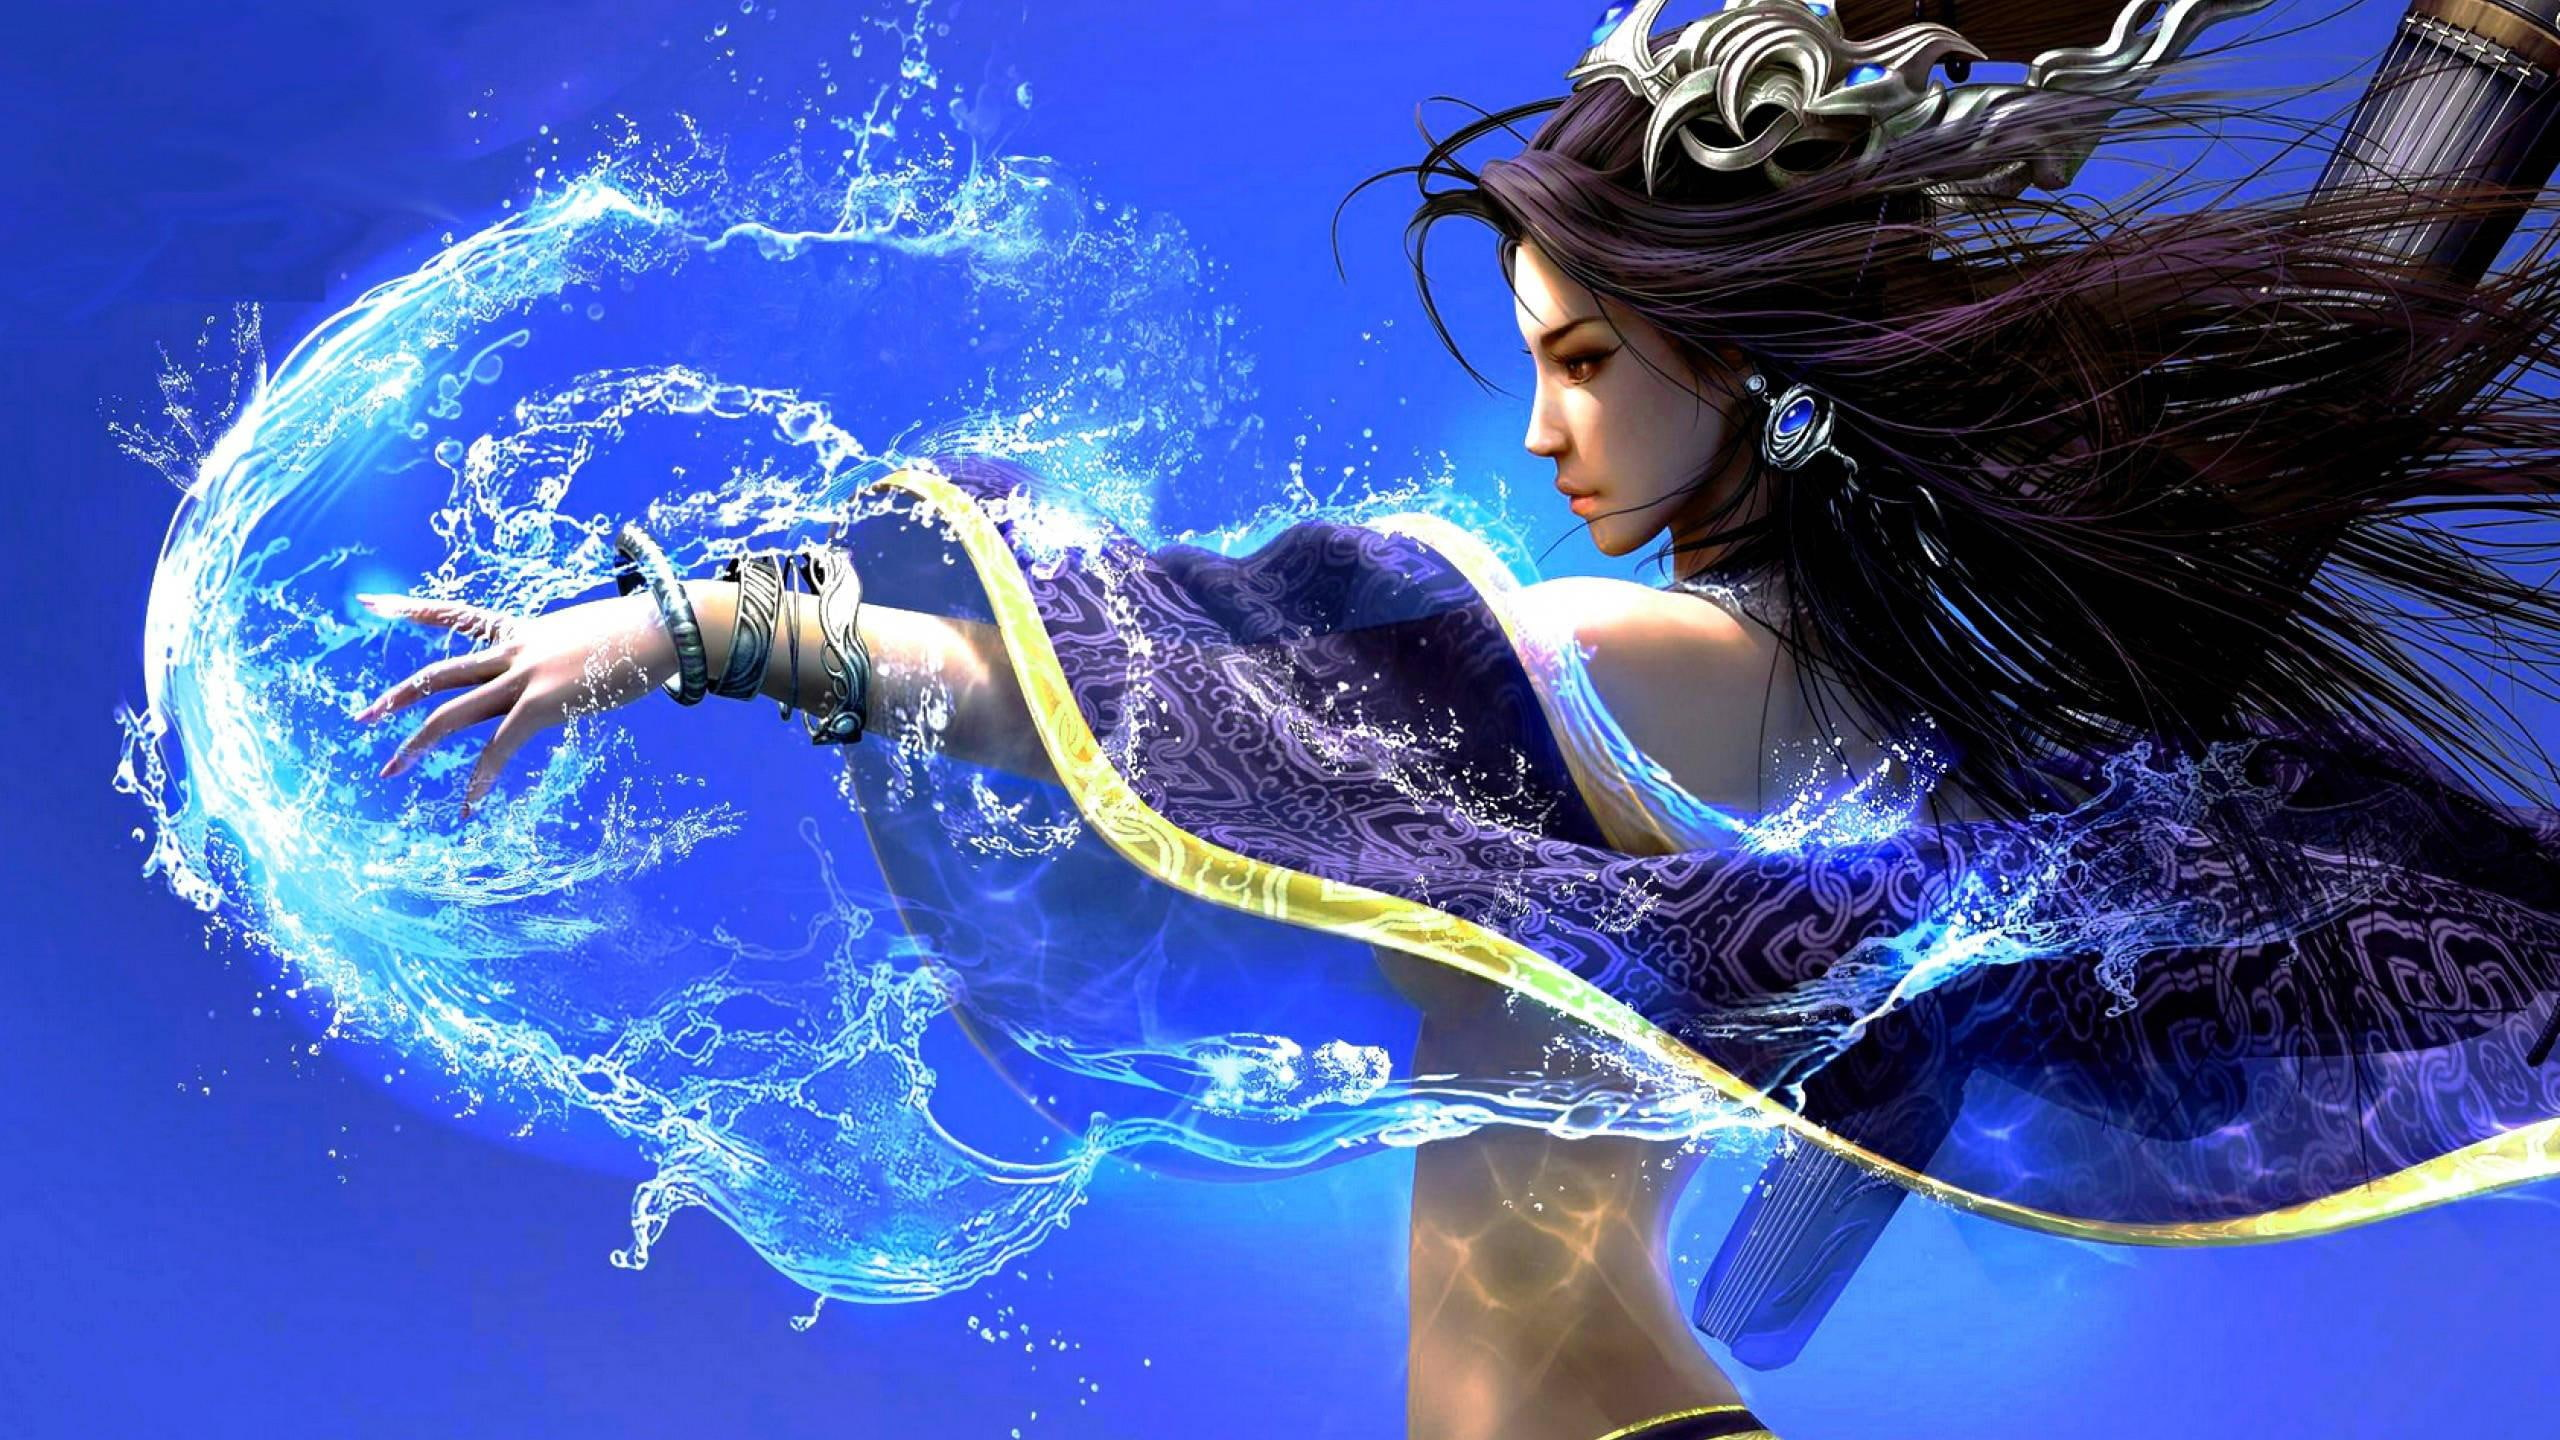 Beautiful Girl, Water, Fantasy, 3d And Abstract - Water Magic Fantasy Art , HD Wallpaper & Backgrounds